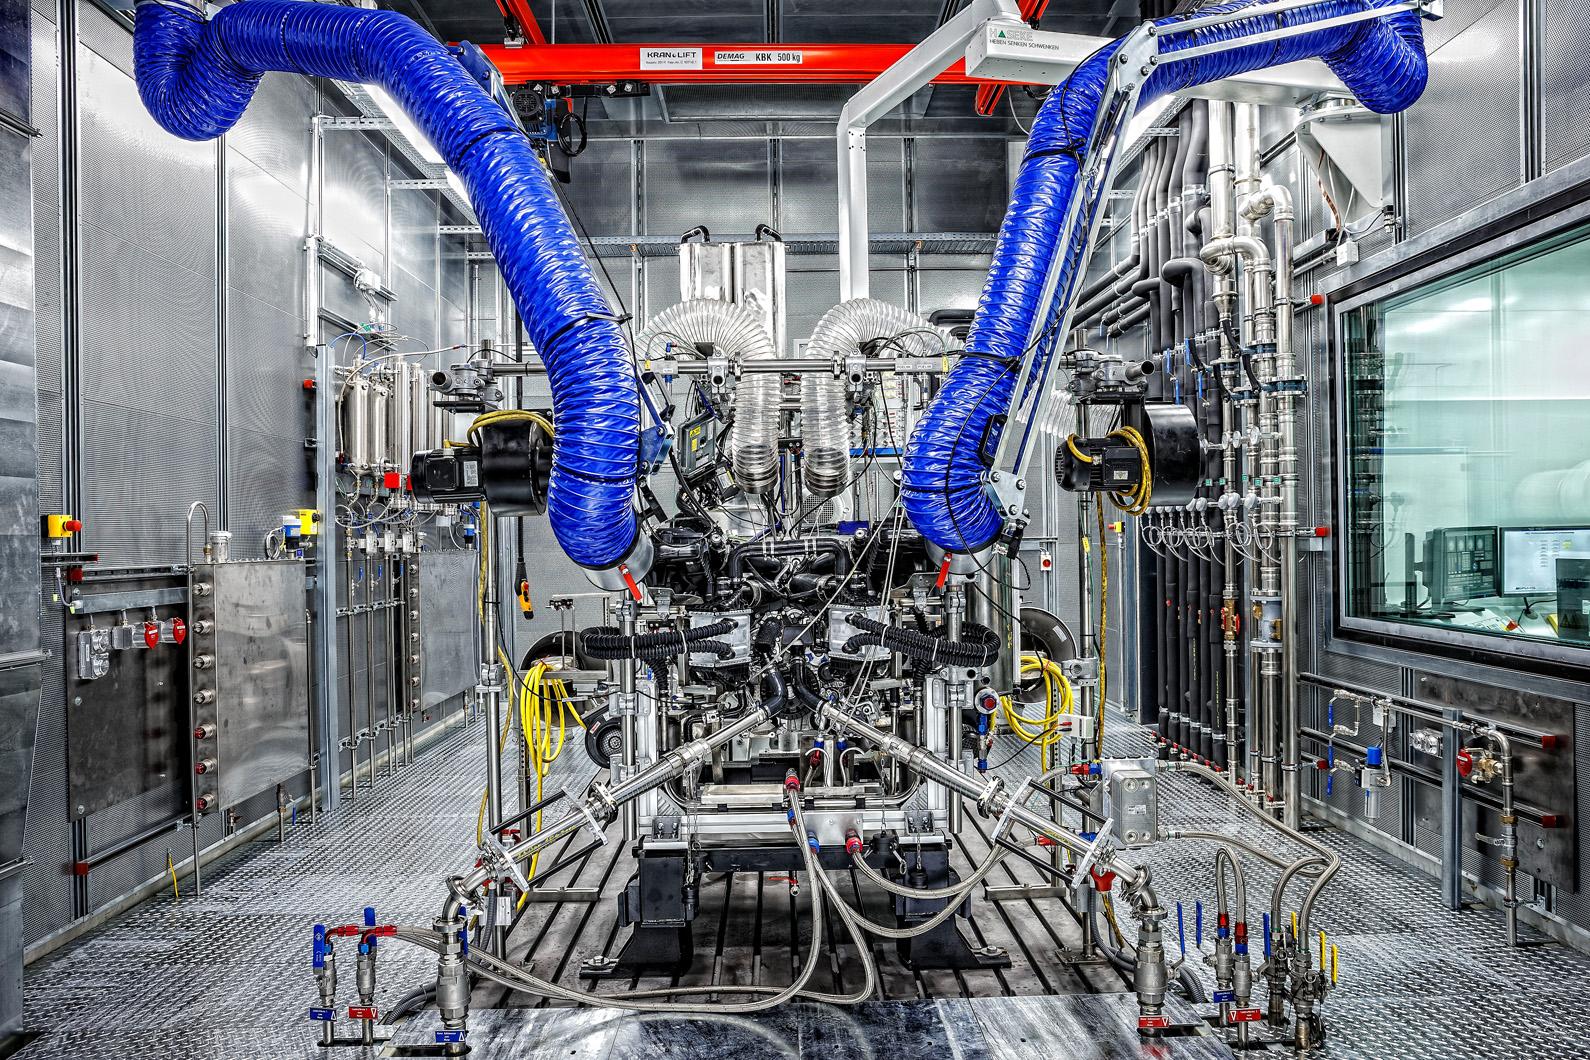 merc-amg-engine-1-0003